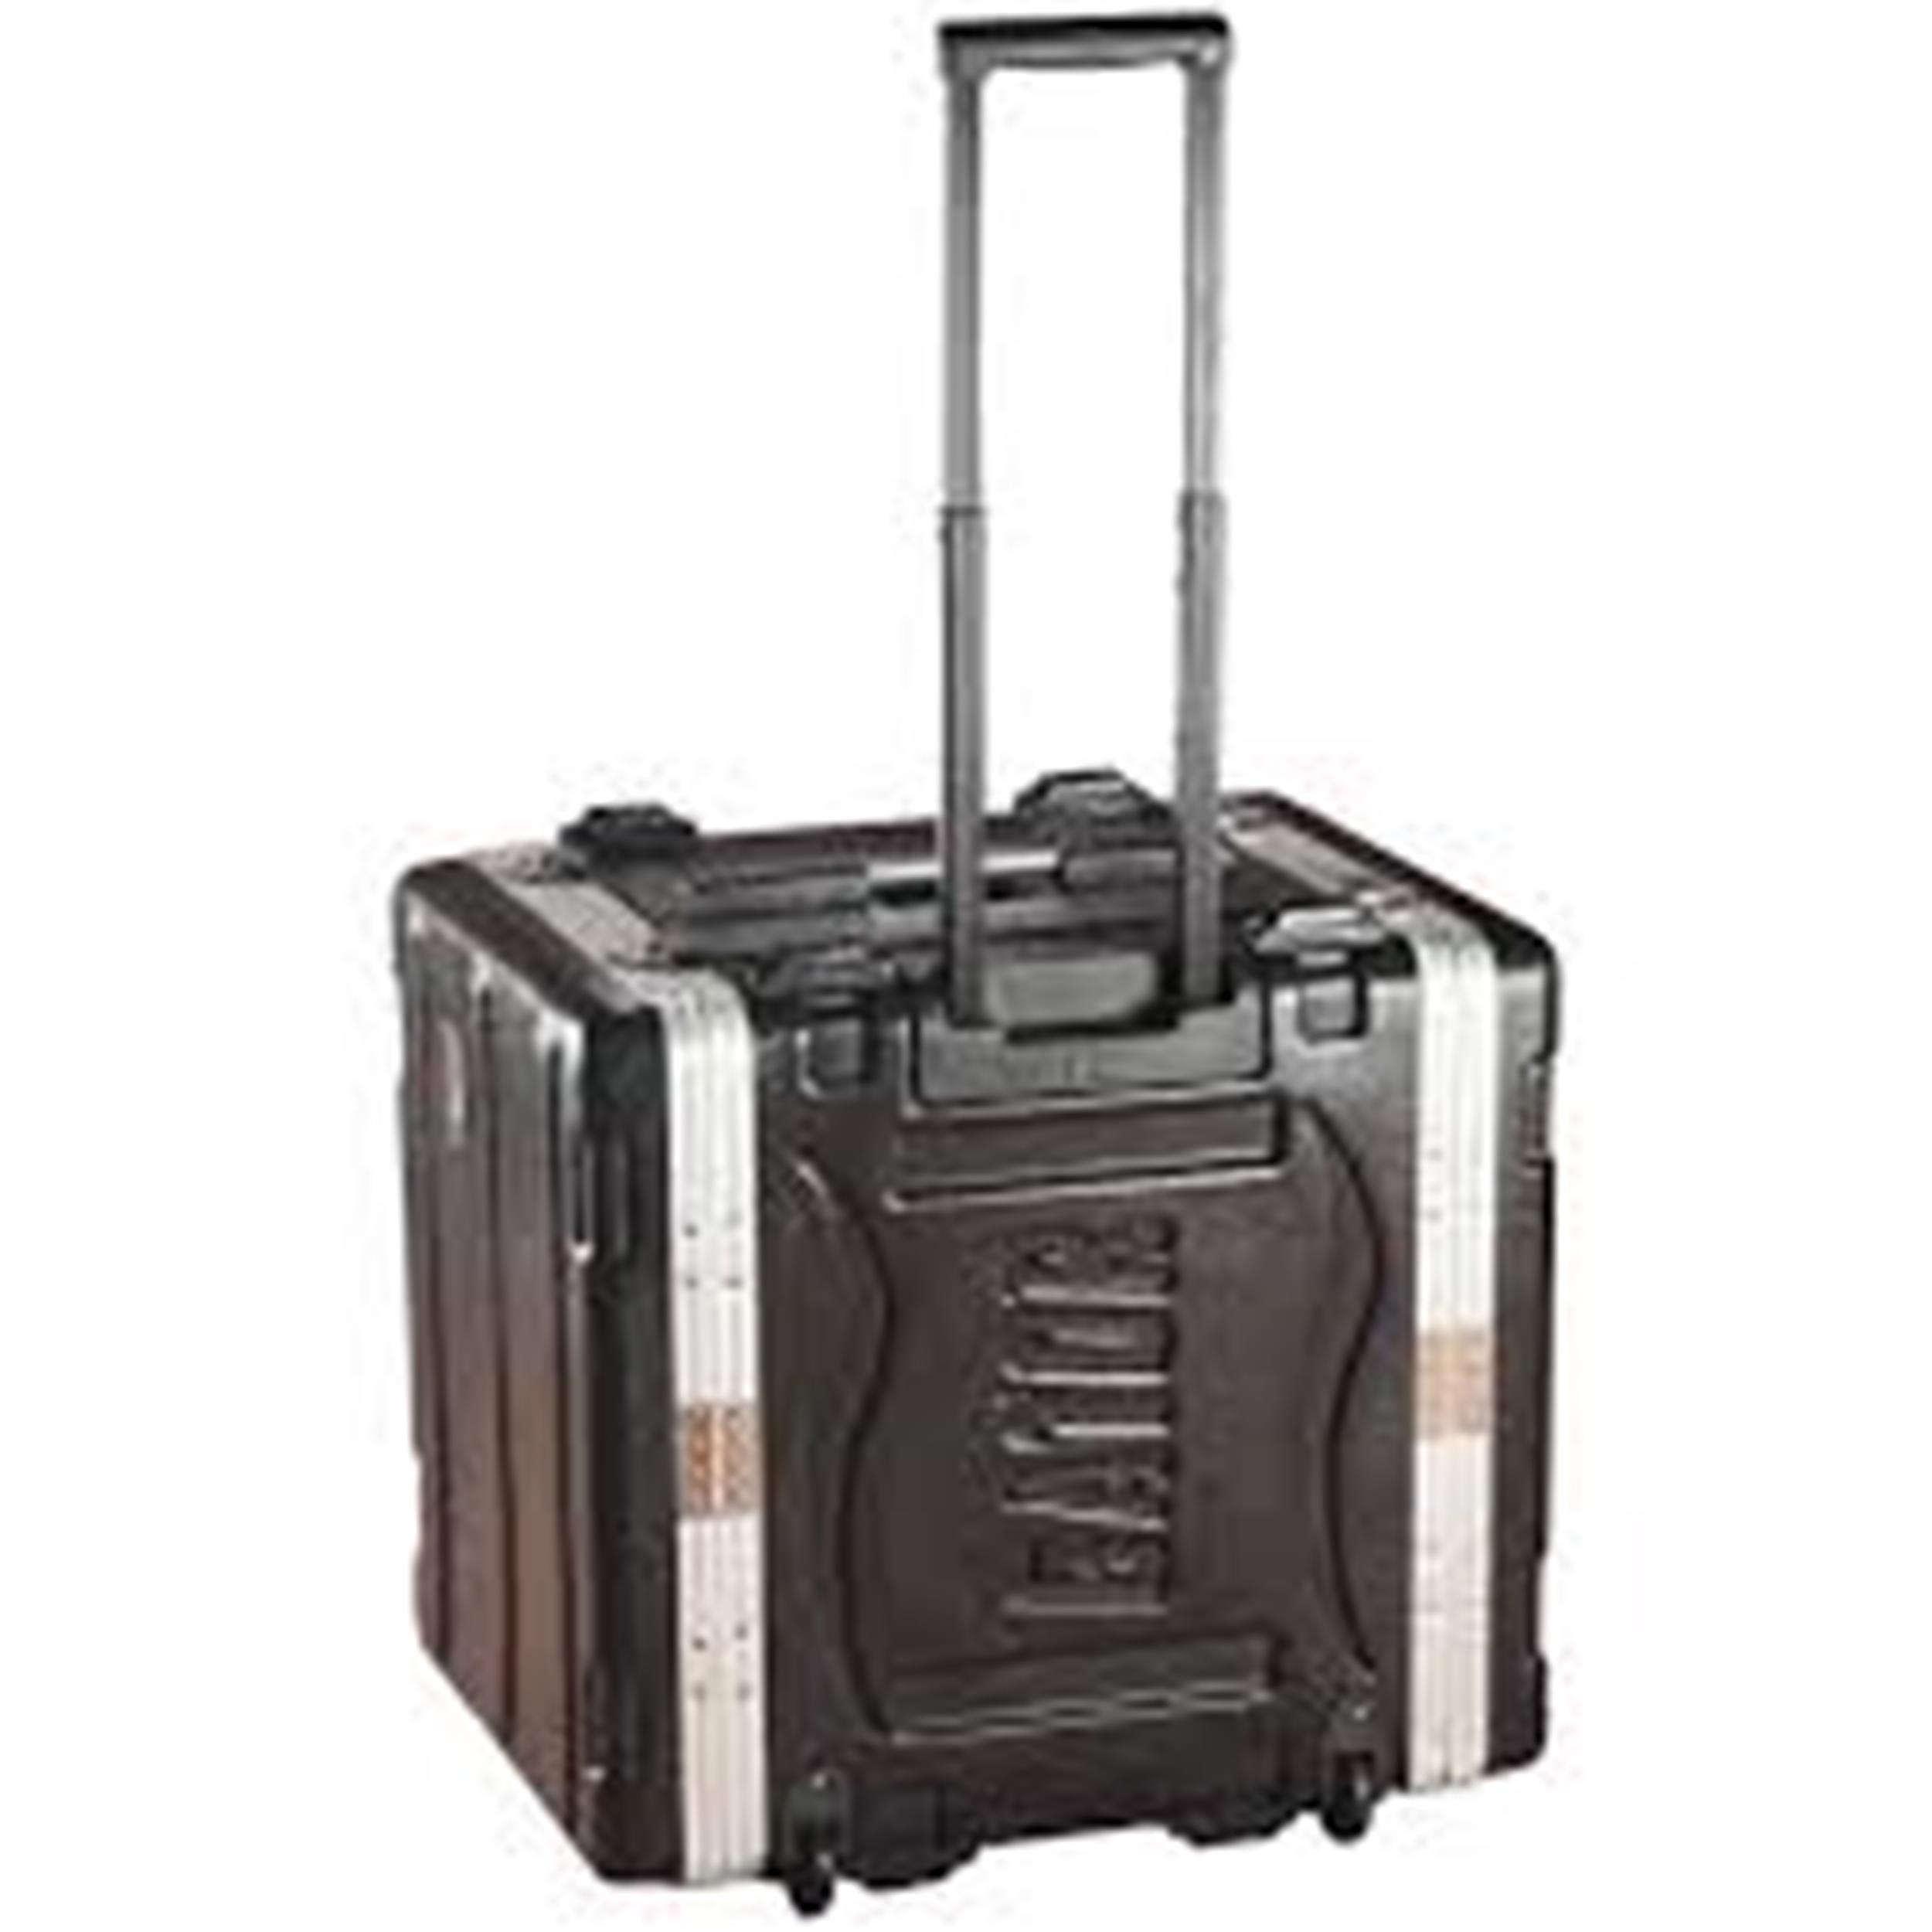 Gator-Cases-GRR-8L-rolling-rack-da-8U-profondit-19-sku-2776759415013